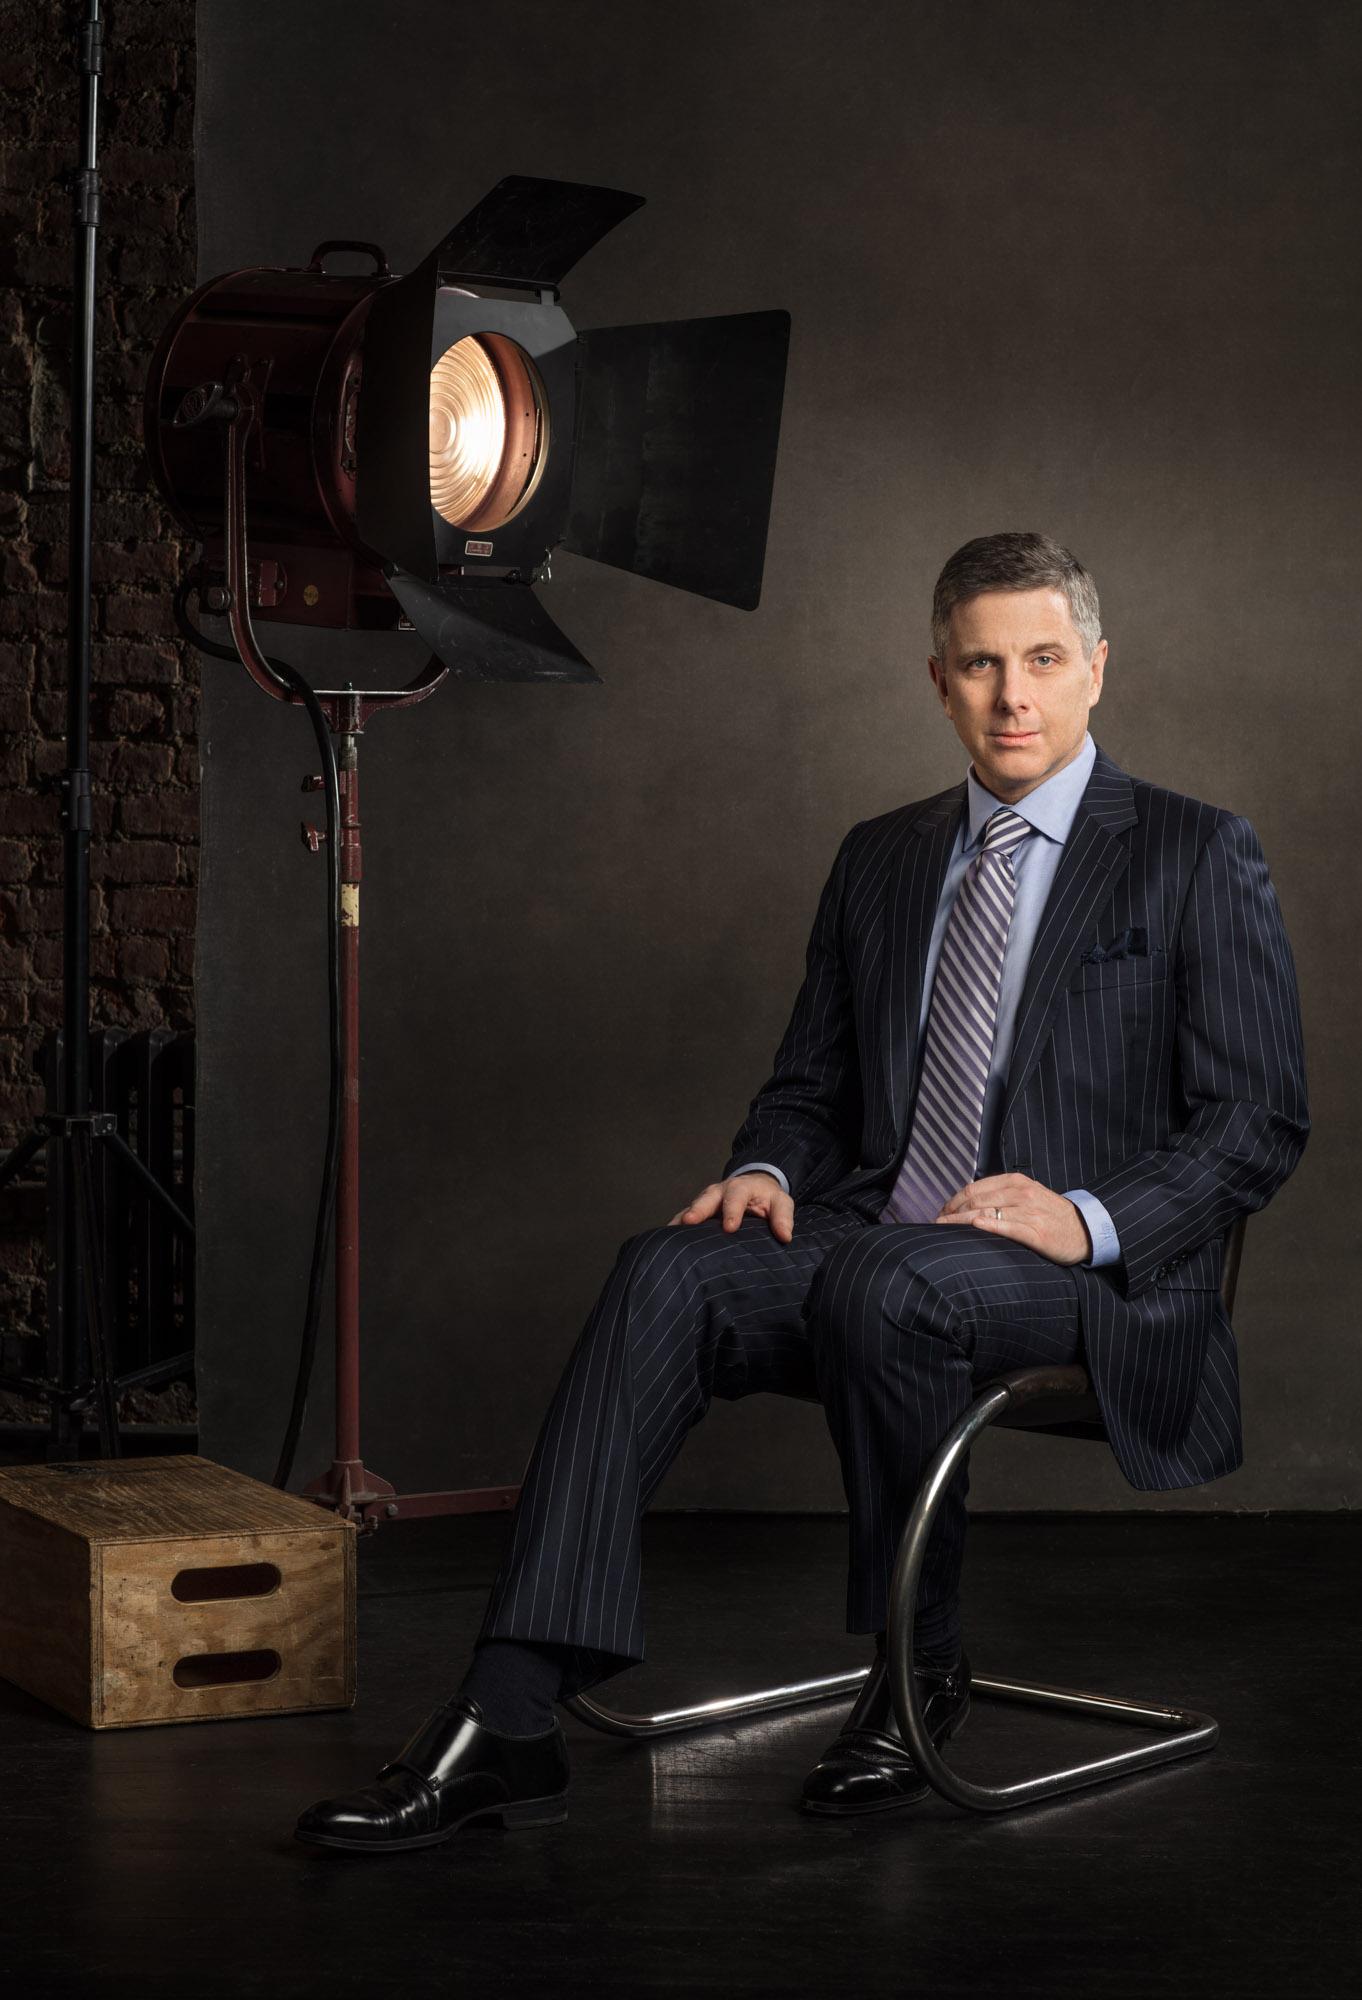 Lawyer photography | portraiture